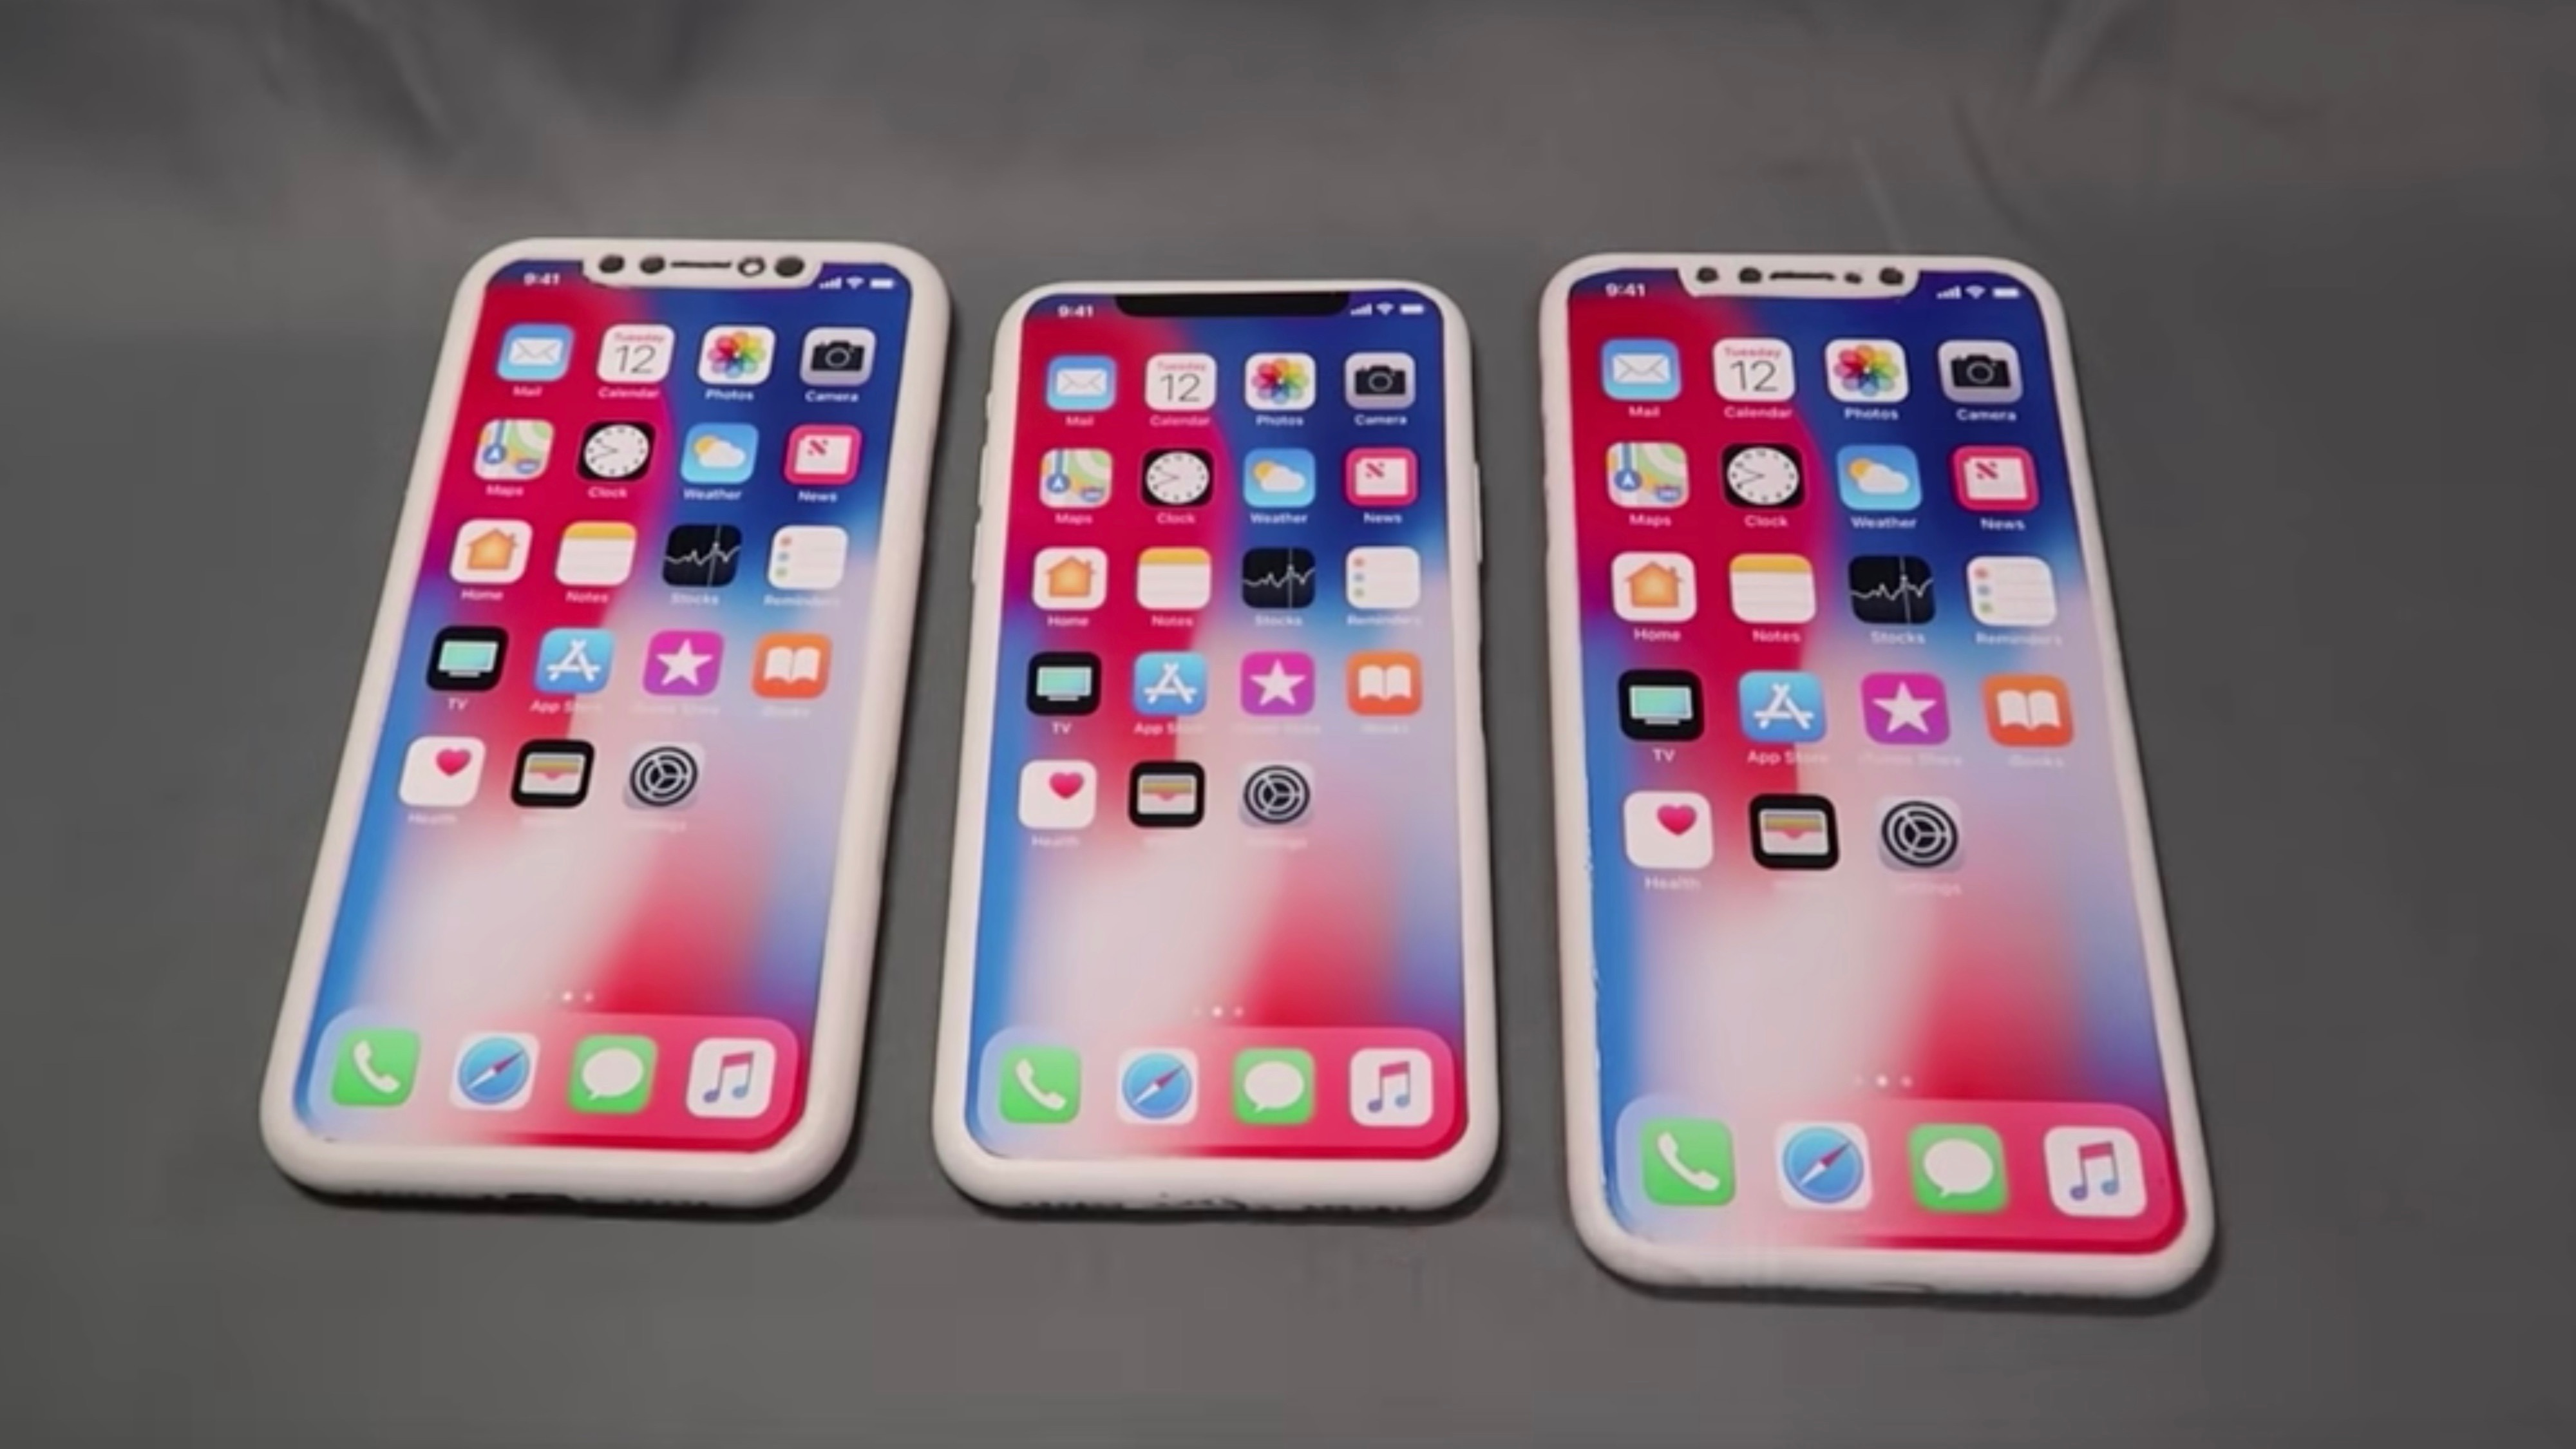 Iphone 6 deals 2018